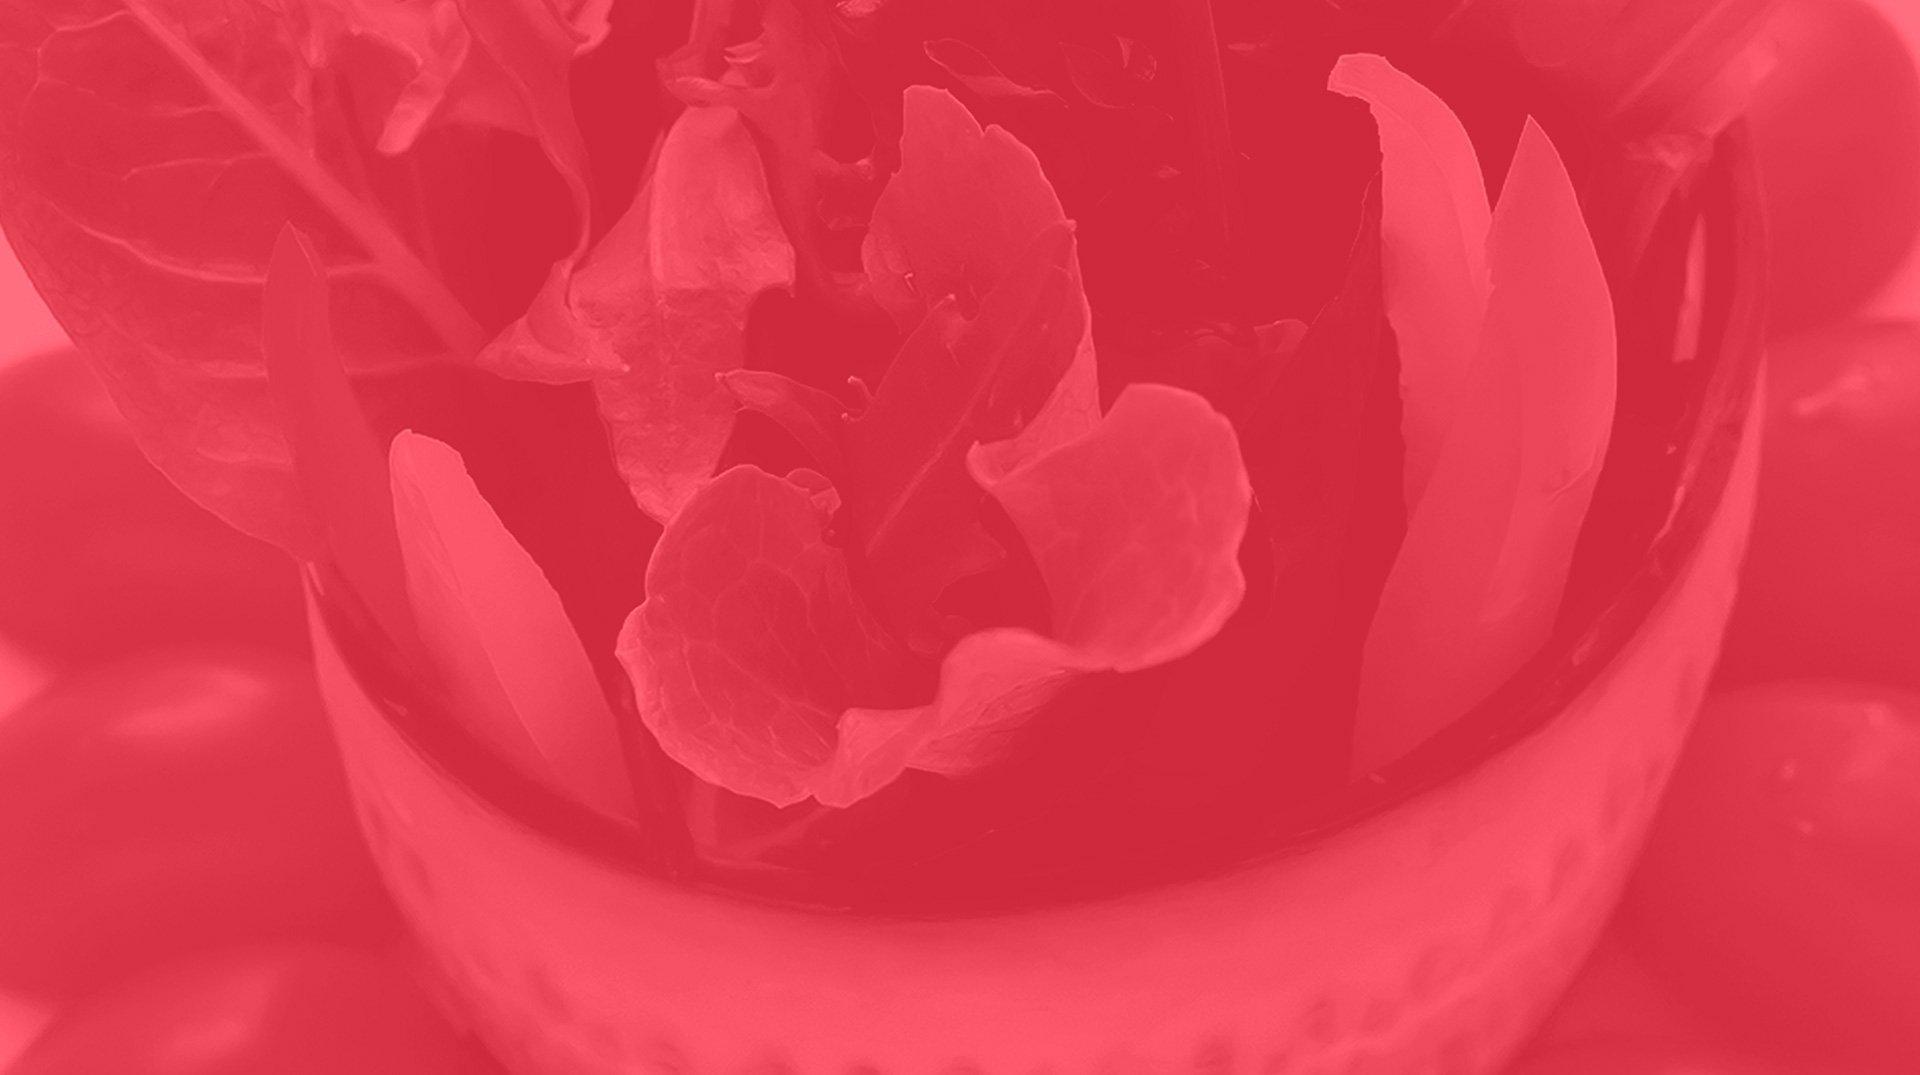 sweet grape header image